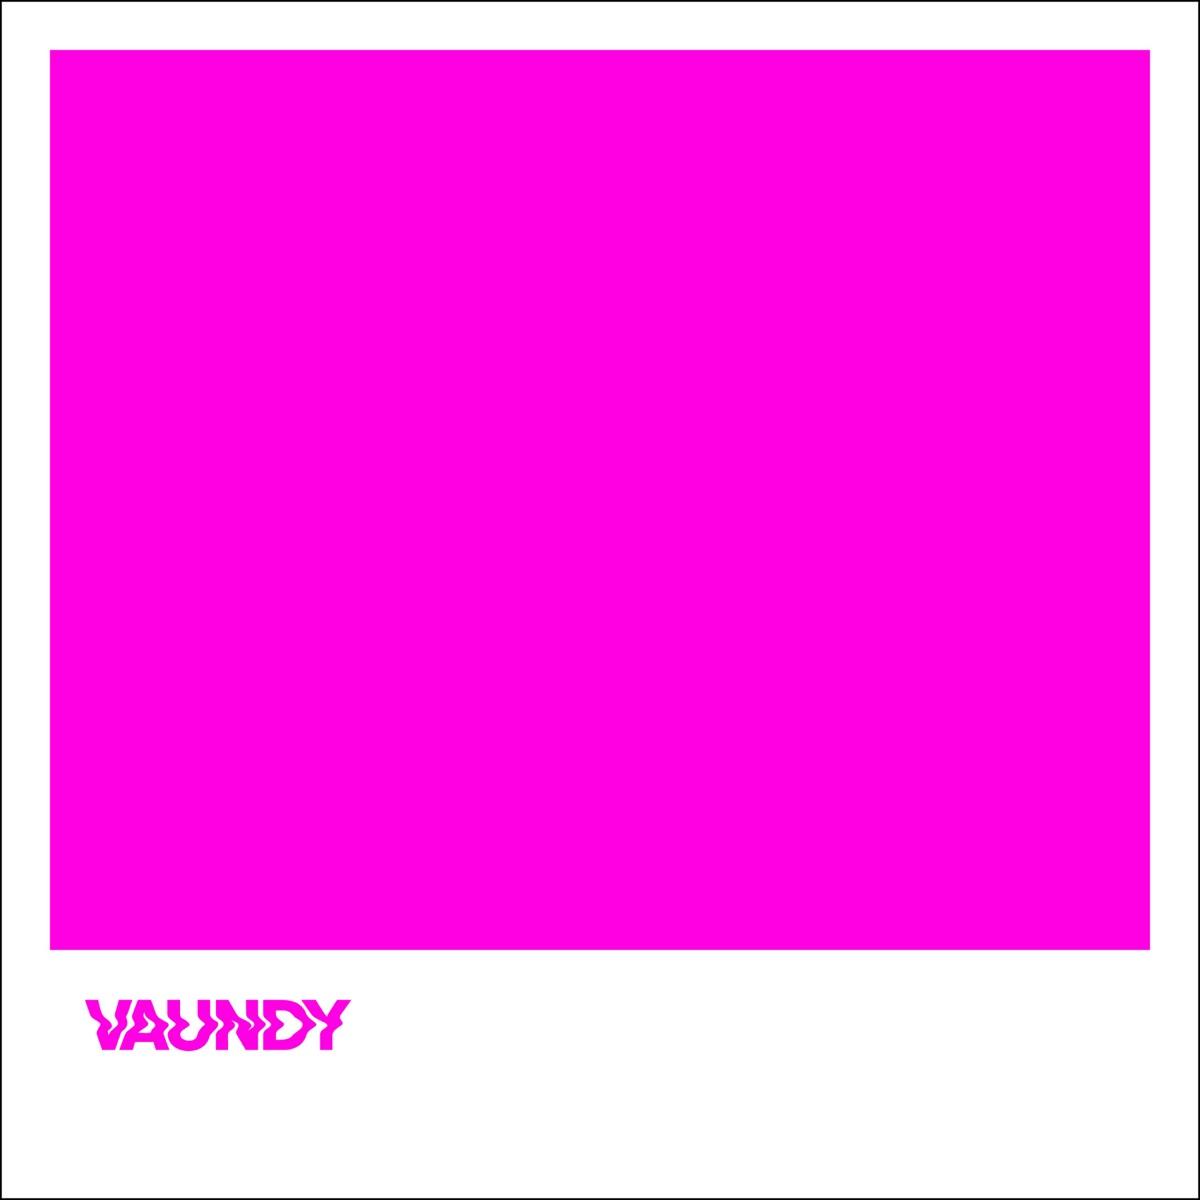 『Vaundy - 灯火 歌詞』収録の『strobo』ジャケット